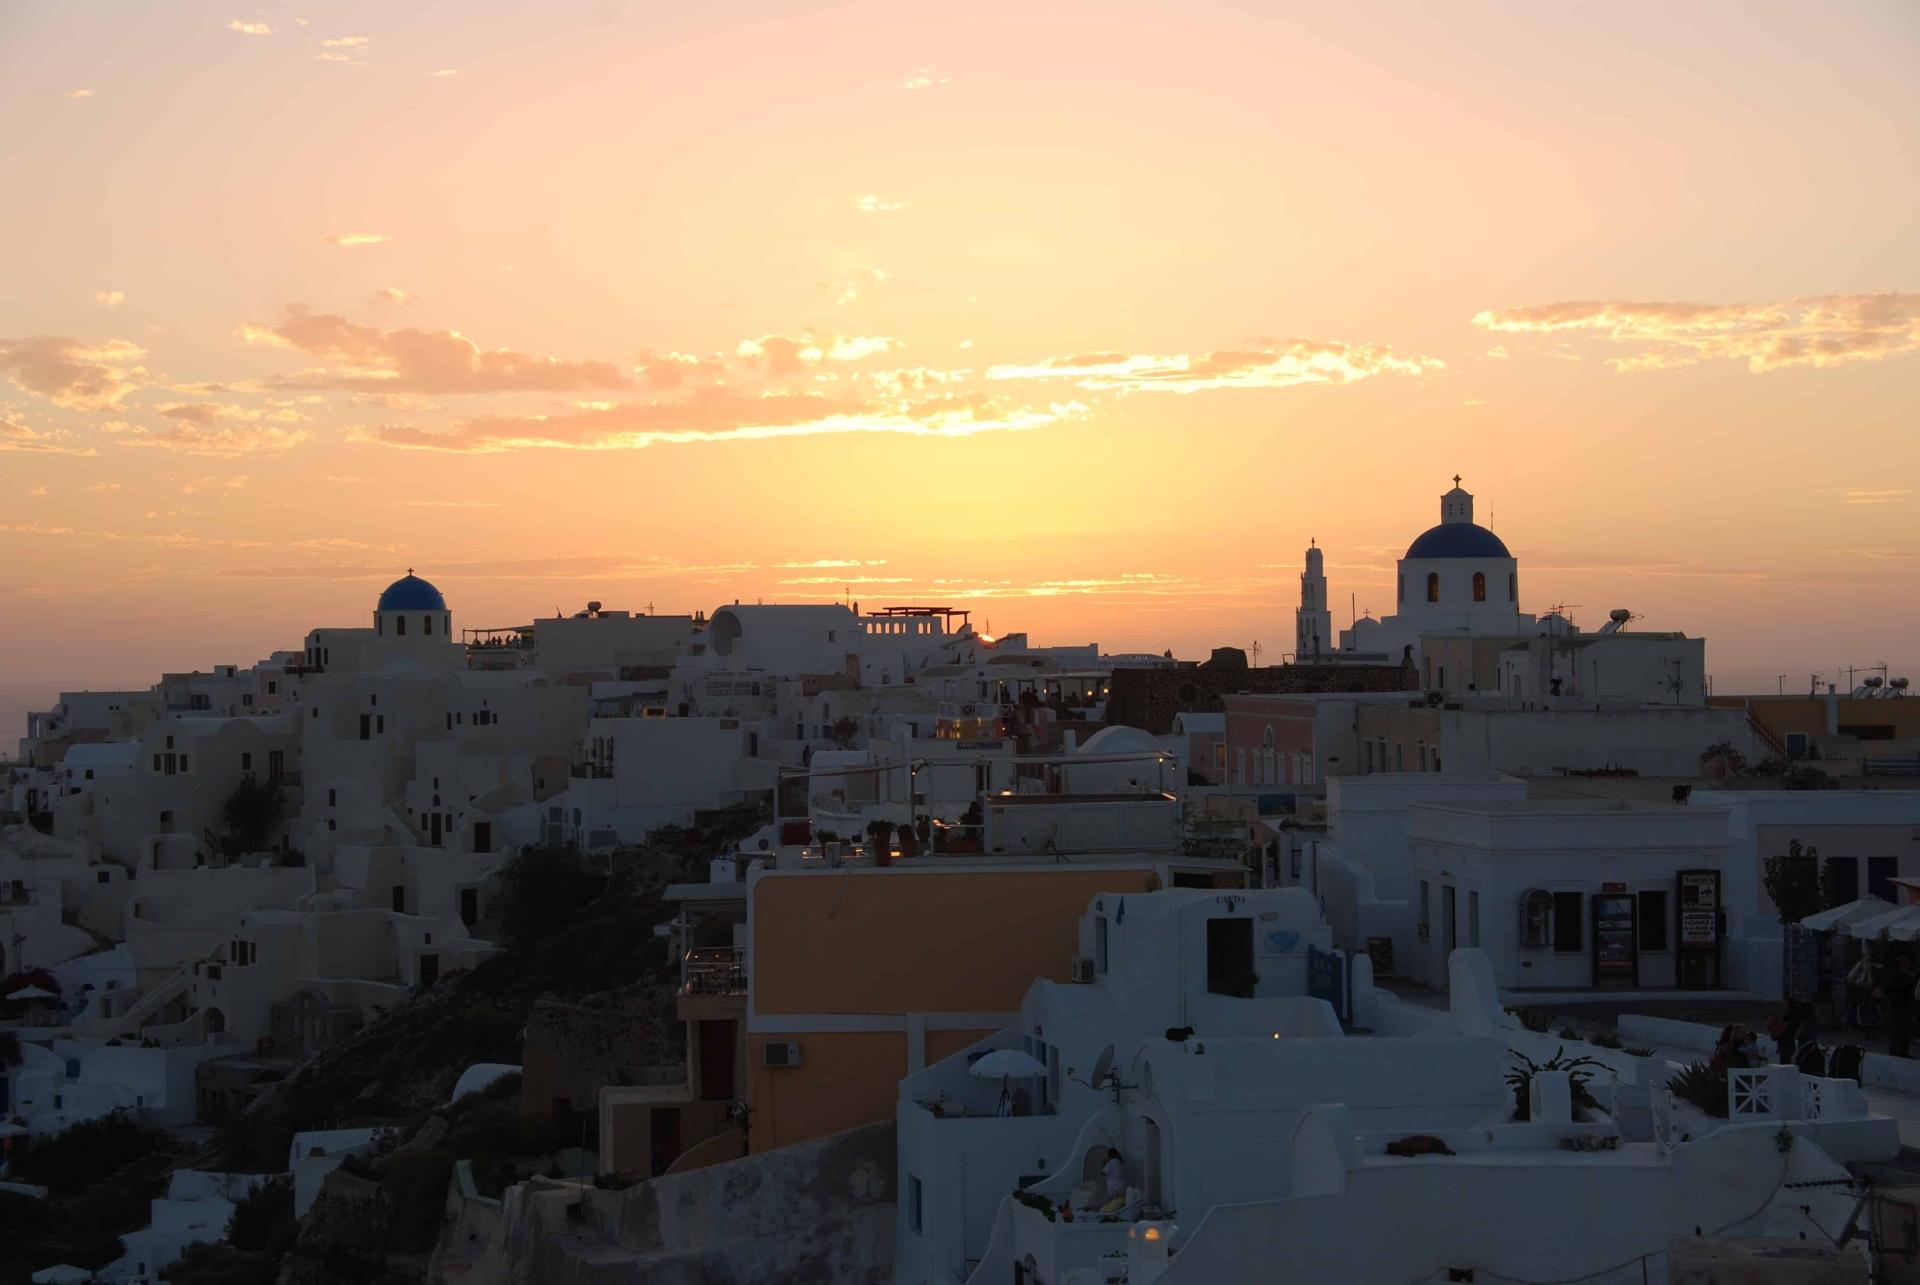 00 Sonnenuntergang Oia Ia Santorin Griechenland Kykladen